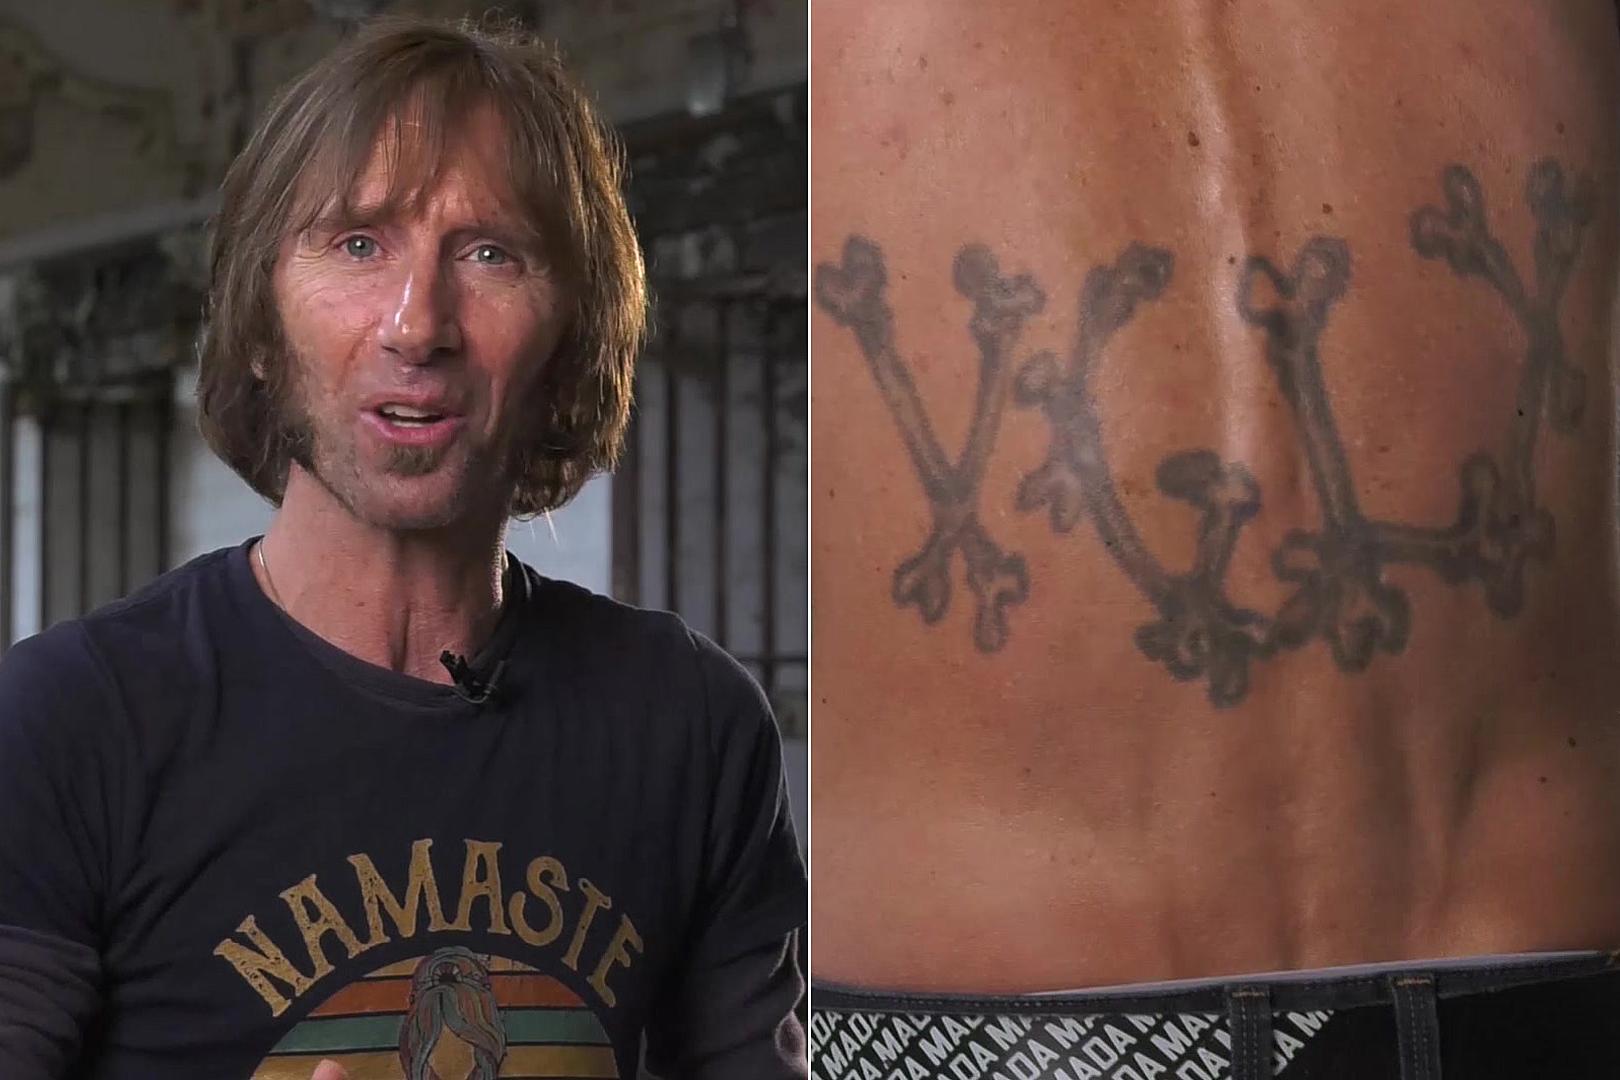 Godsmack's Shannon Larkin Didn't Realize a Legend Offered to Tattoo Him